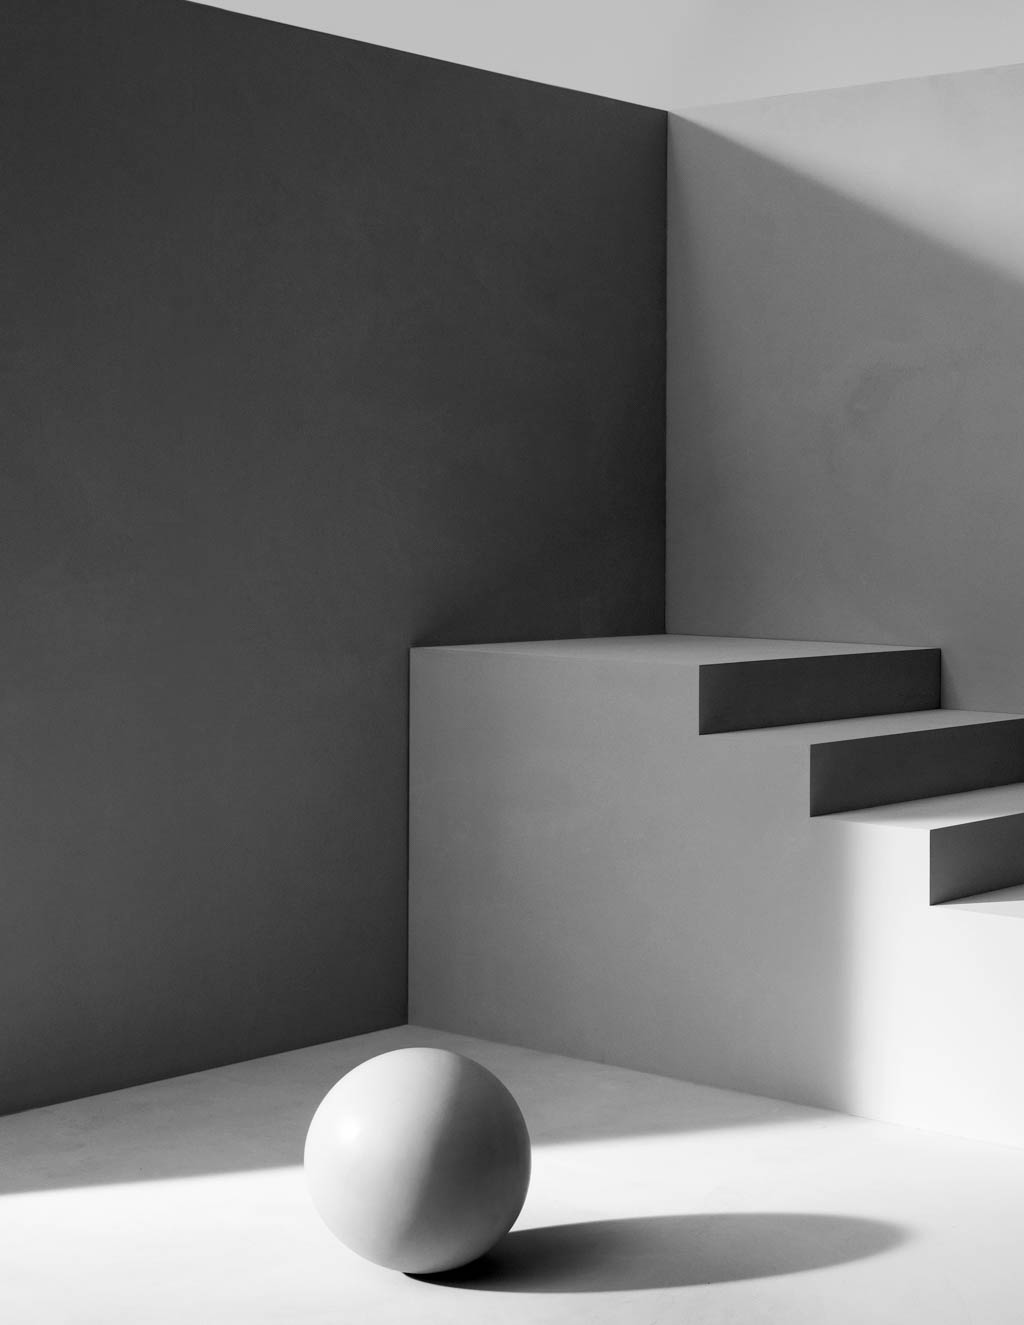 JonasBjerrePoulsen_MoversAndCashmere_I_Architectura_Web_1024x1325px